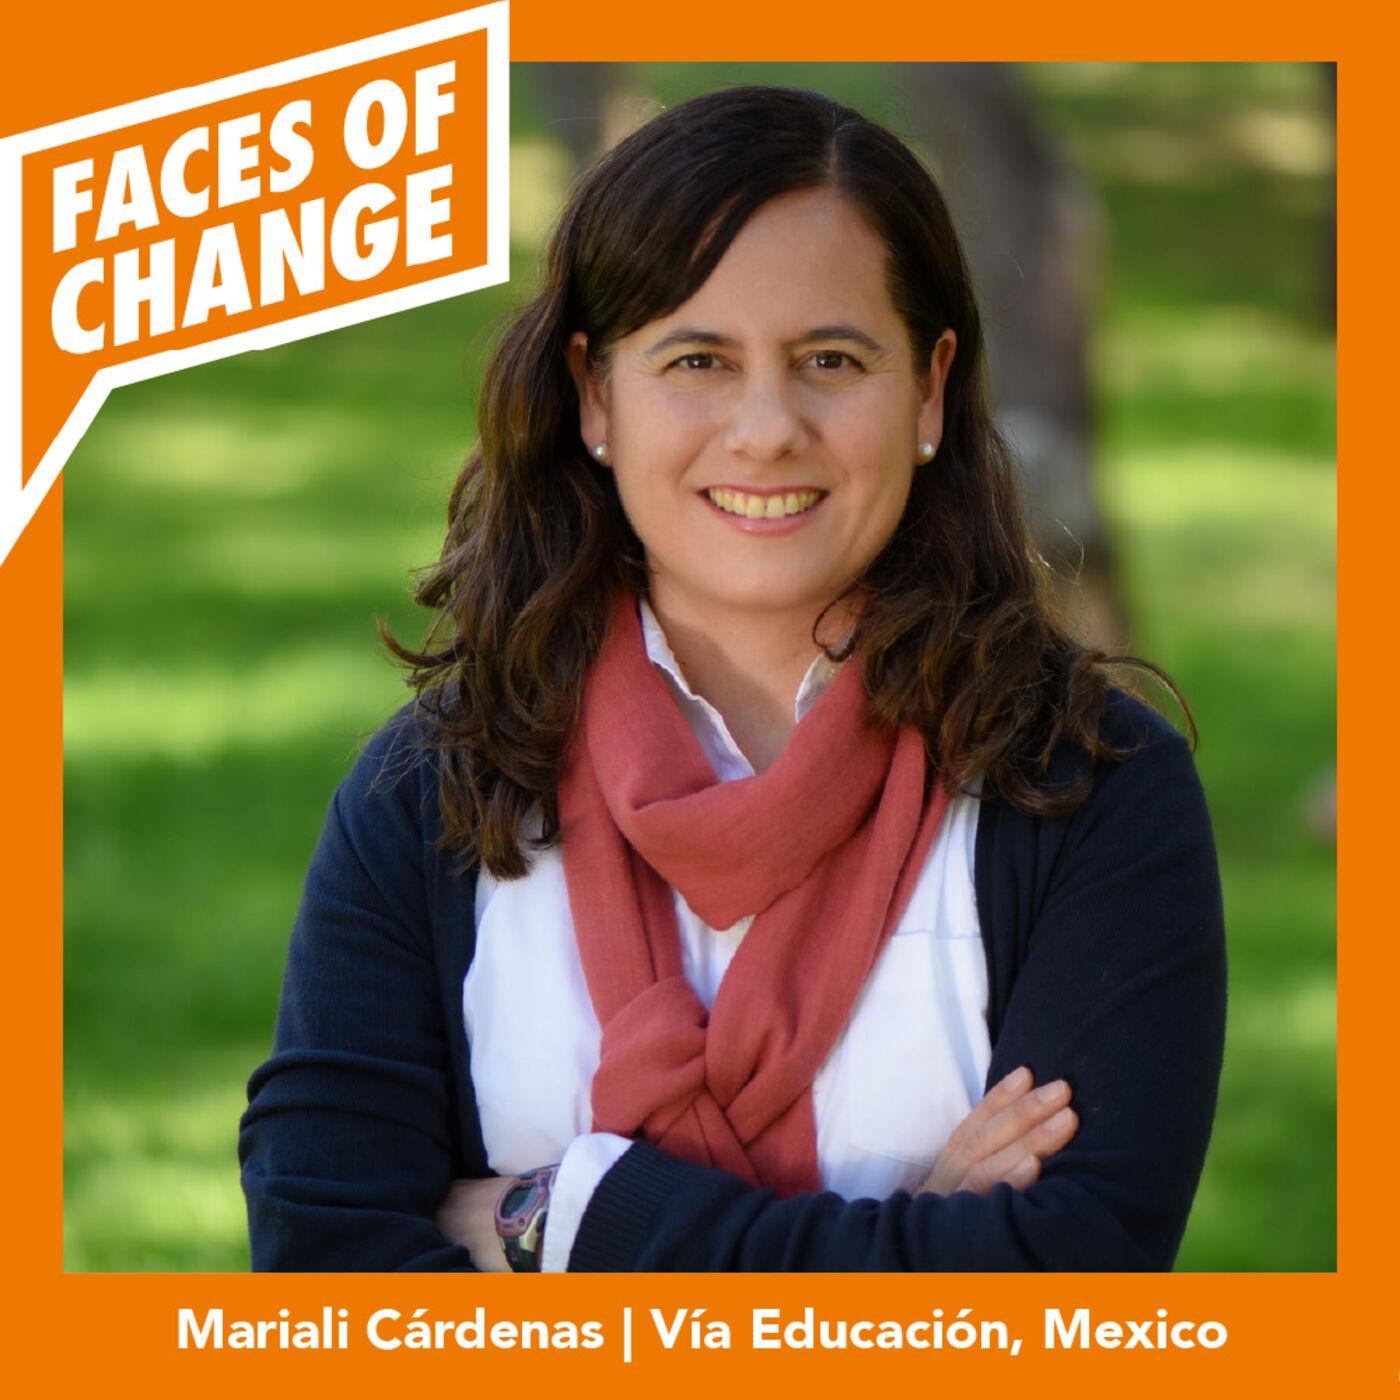 Mariali Cárdenas --- Vía Educación, Mexico